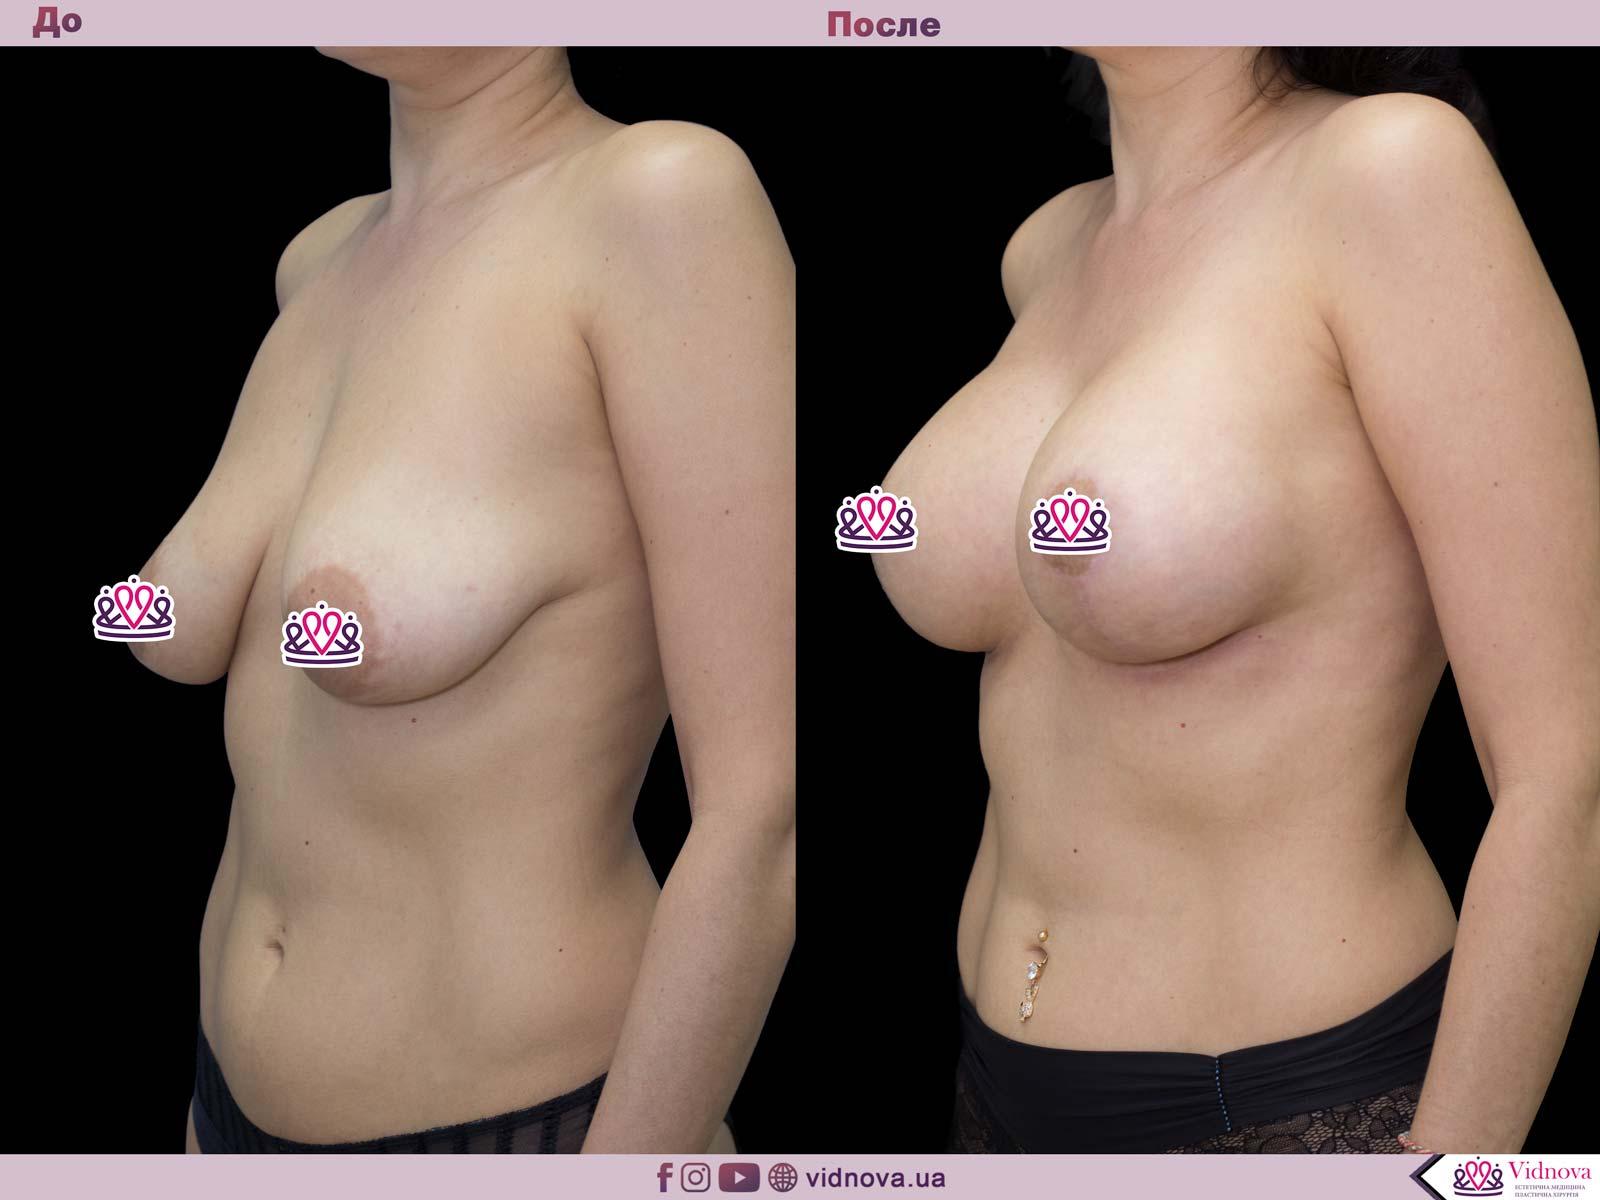 Подтяжка груди: Фото ДО и ПОСЛЕ - Пример №22-2 - Клиника Vidnova